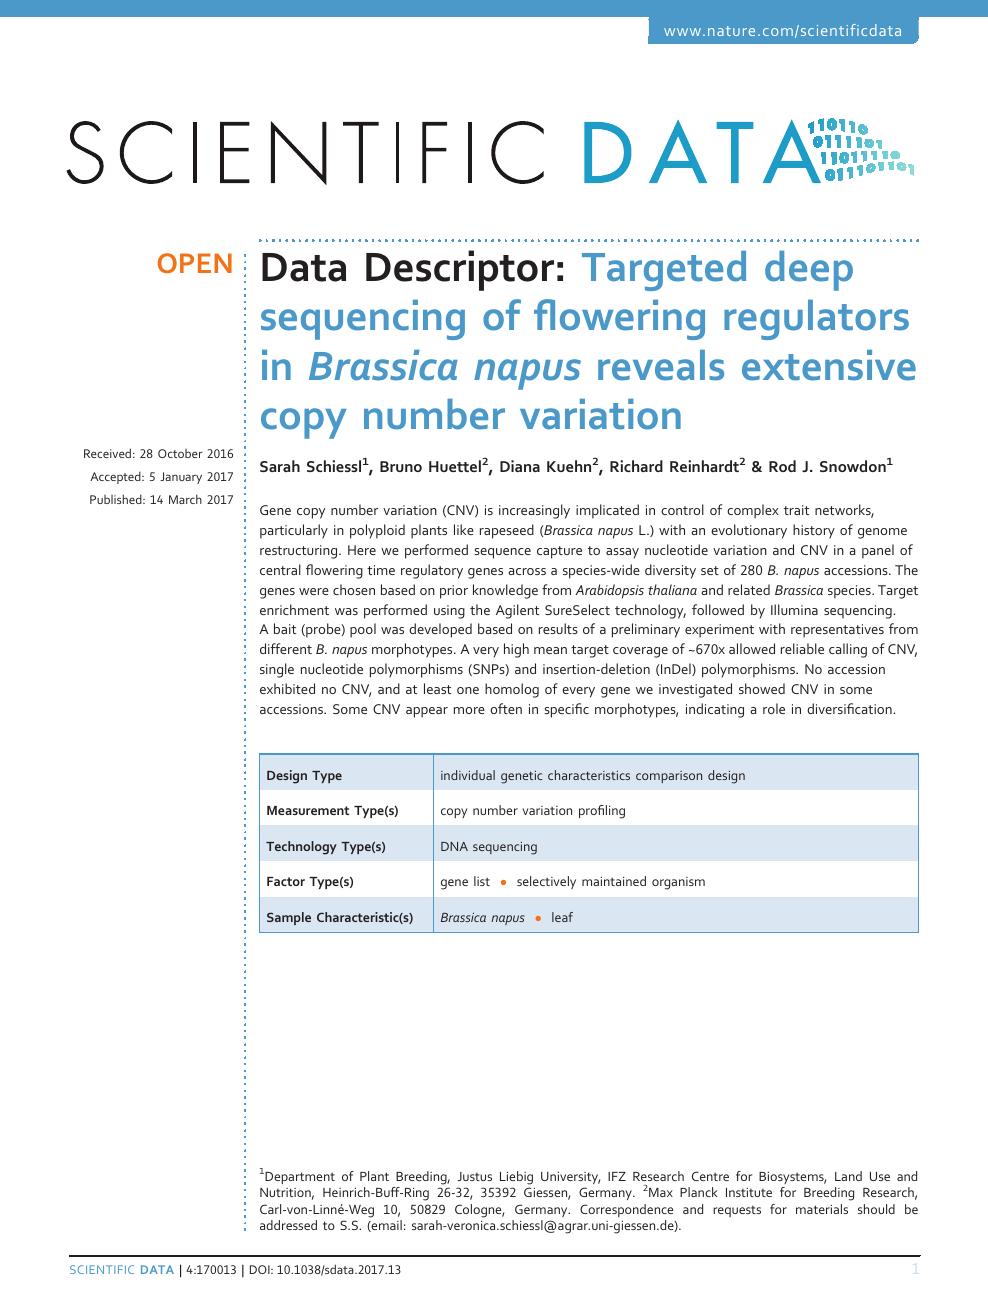 Targeted deep sequencing of flowering regulators in Brassica napus